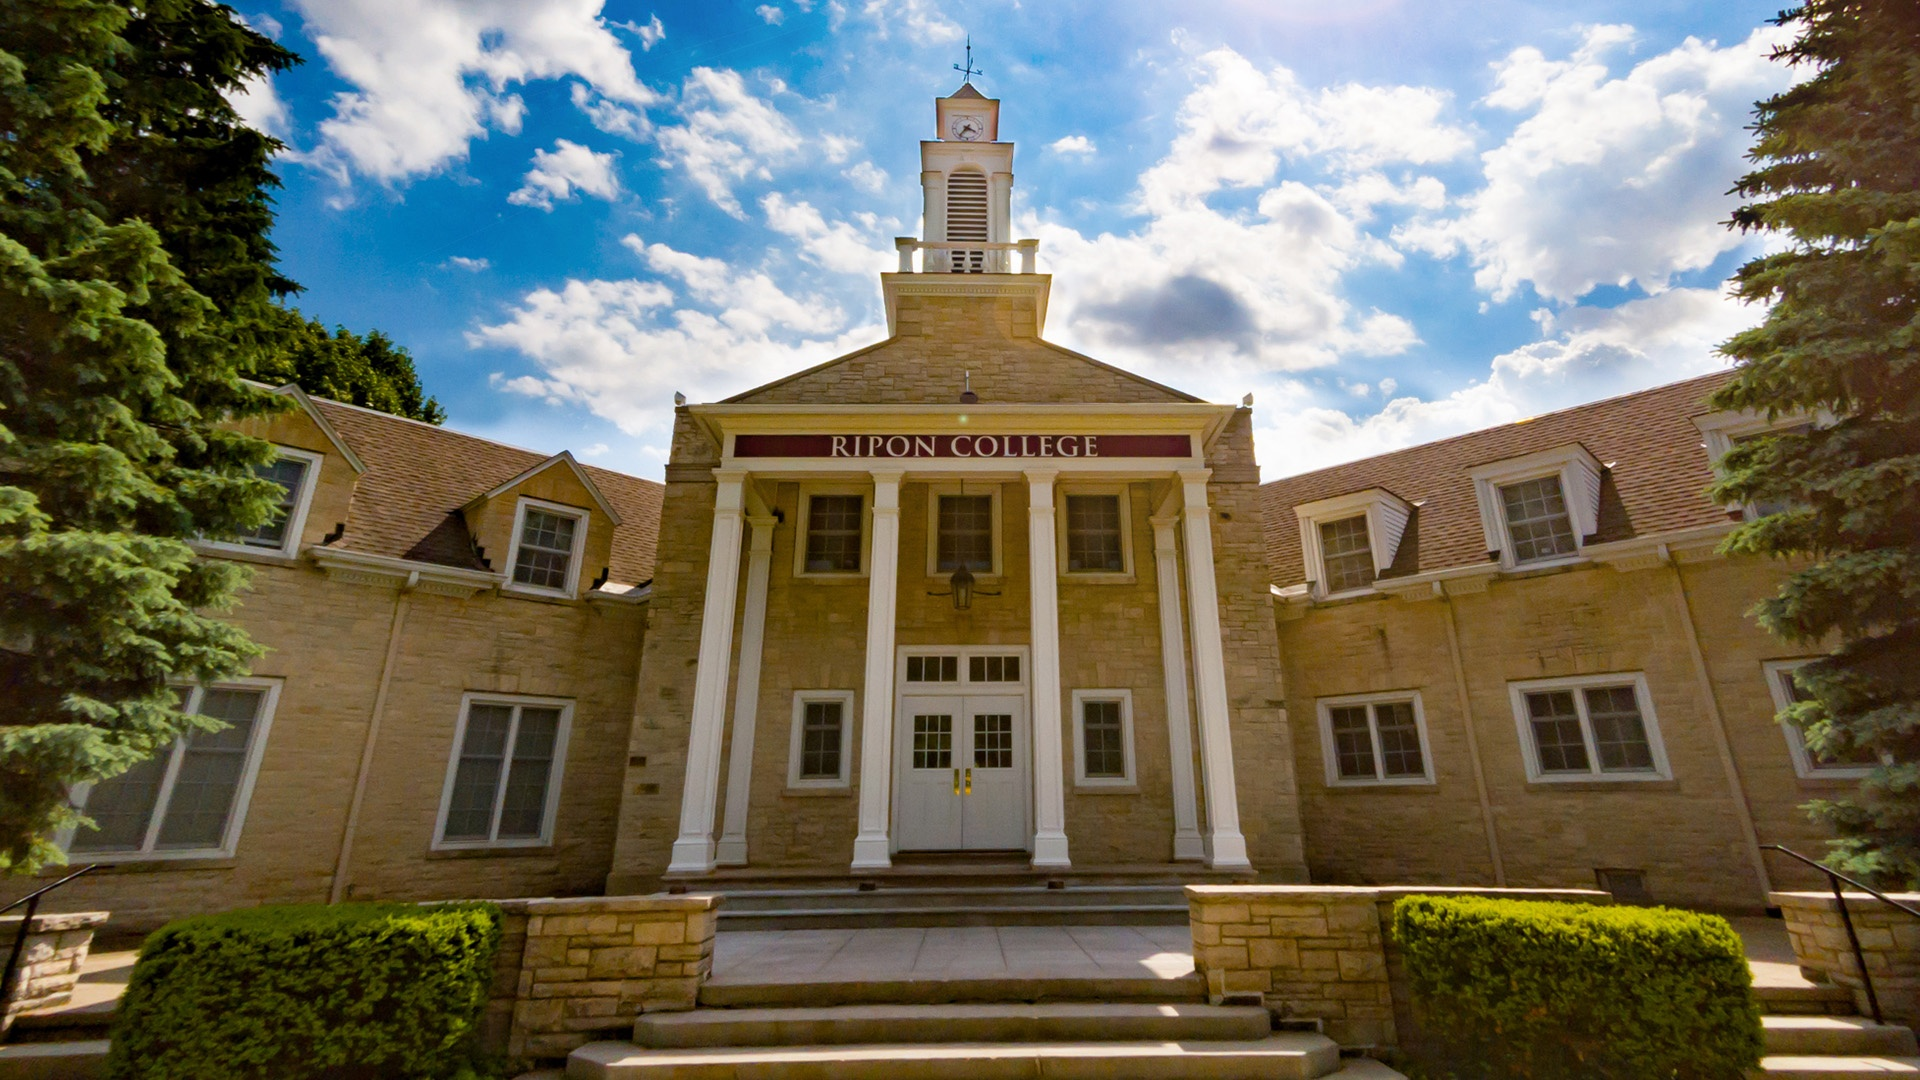 Harwood Memorial Union